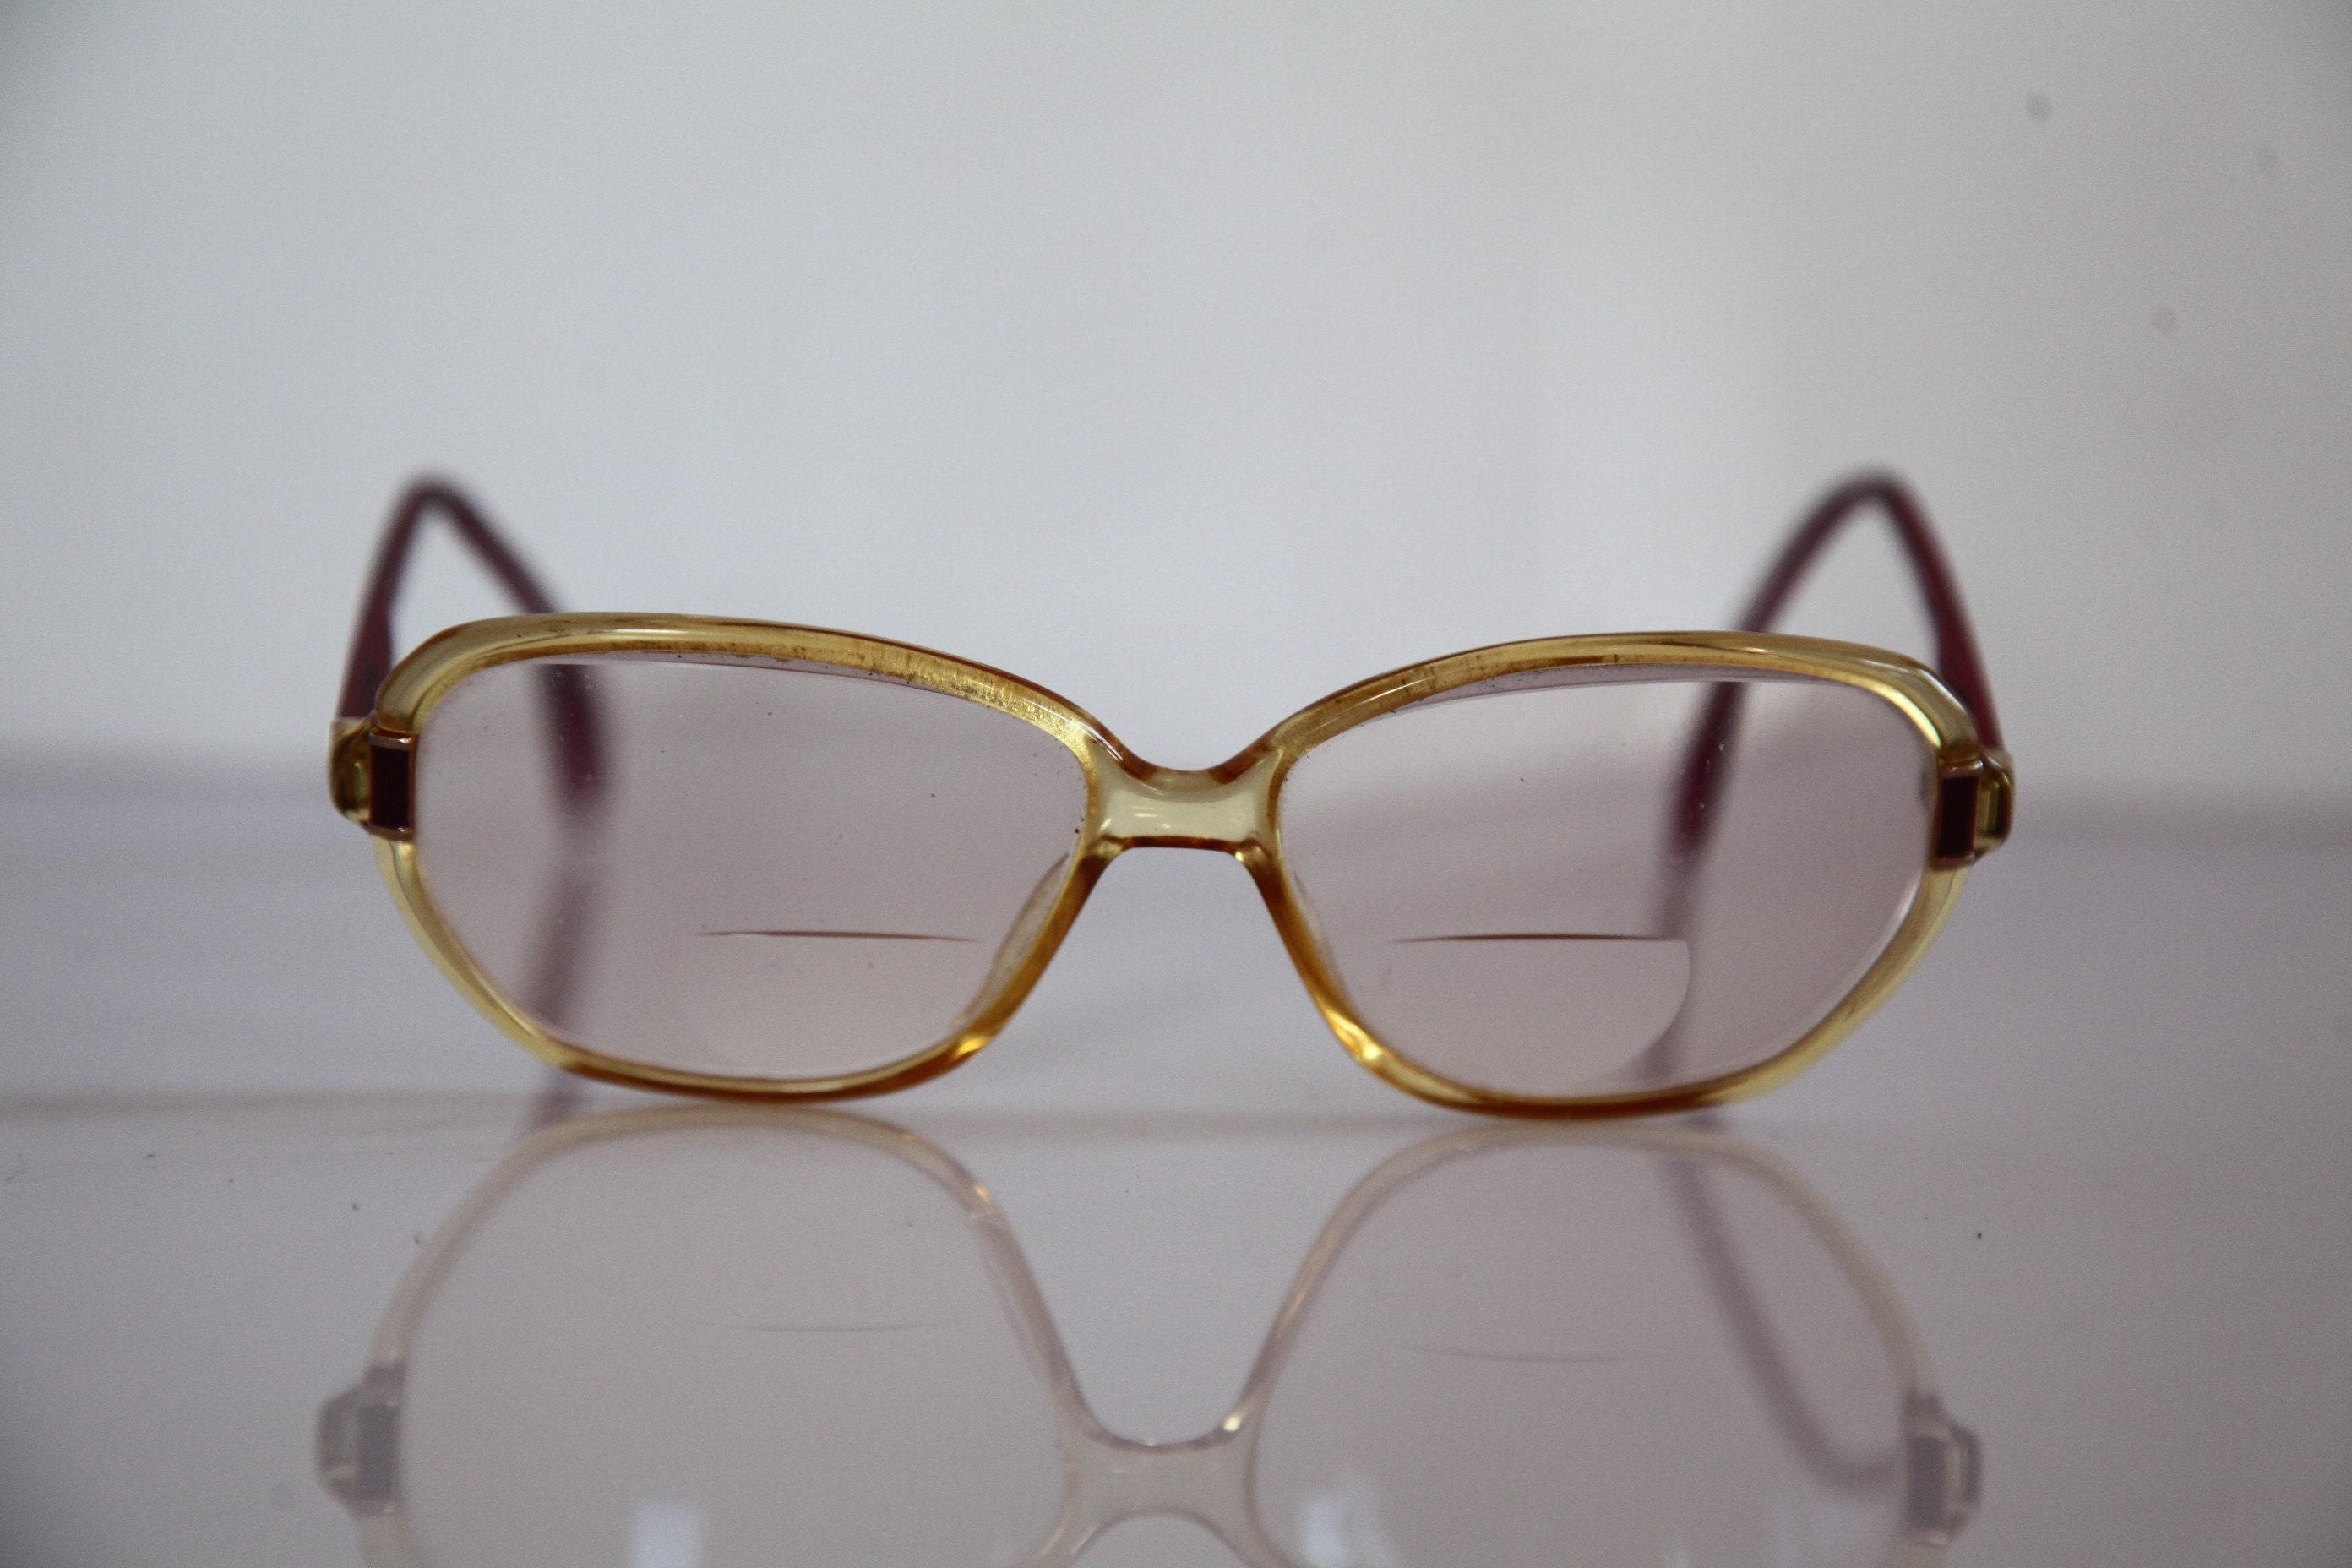 c7a8f549acf Vintage CARL ZEISS PORTRAIT Eyewear